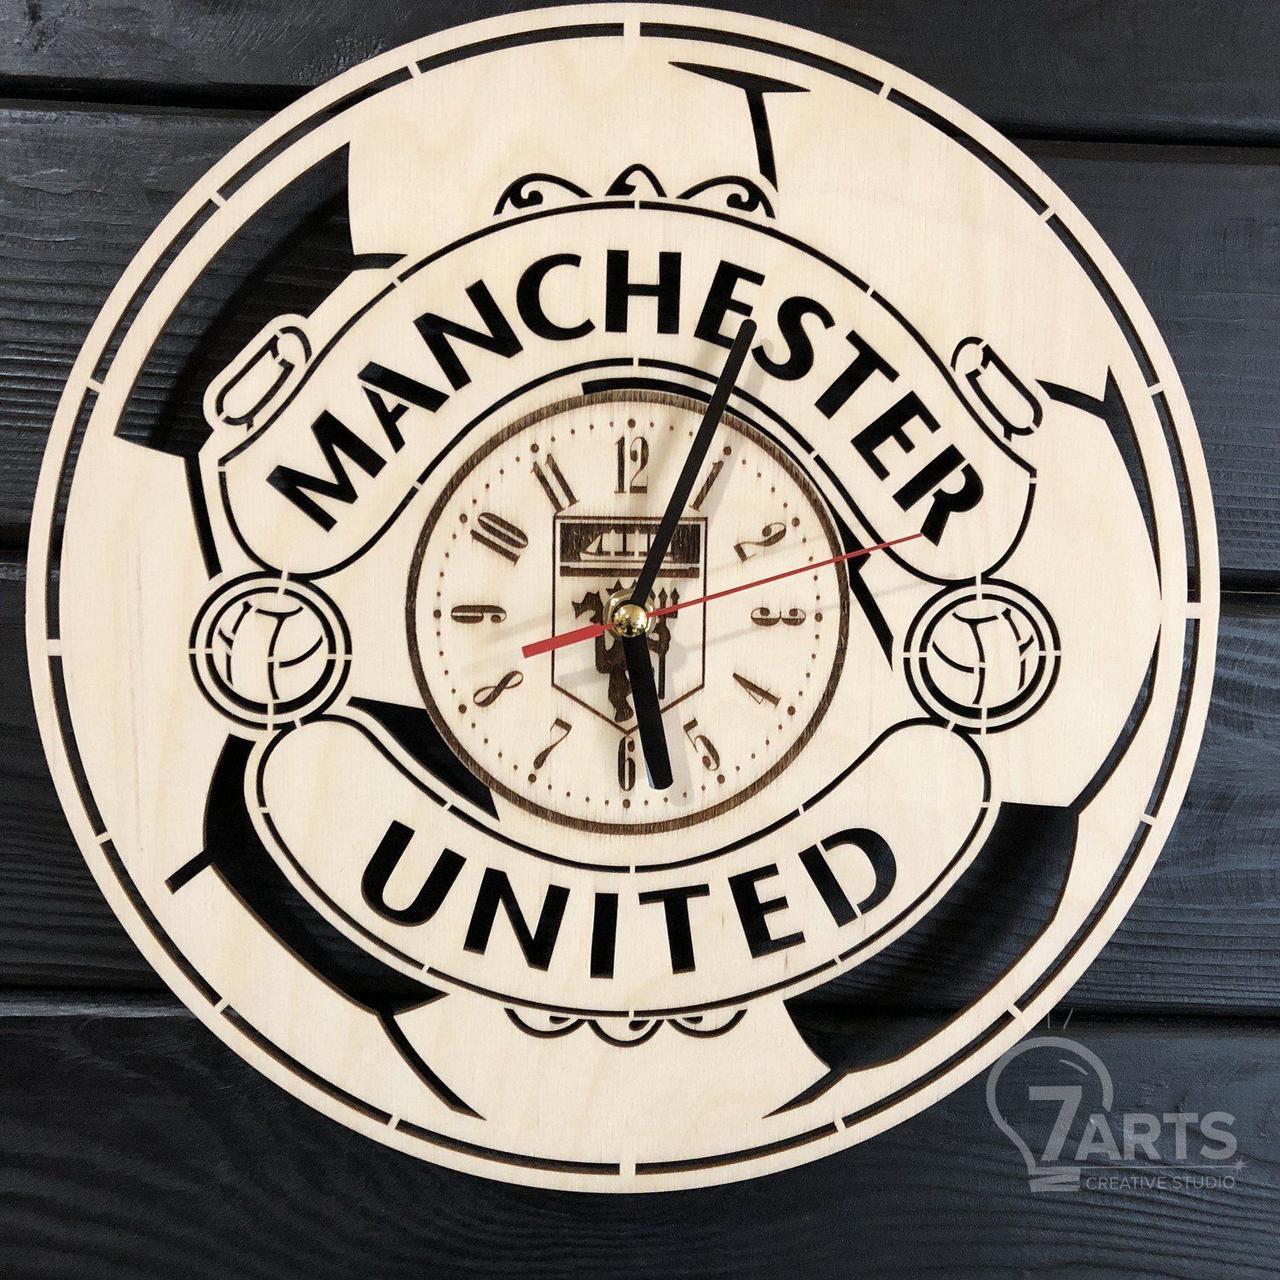 Концептуальные настенные часы в интерьер «Manchester United»